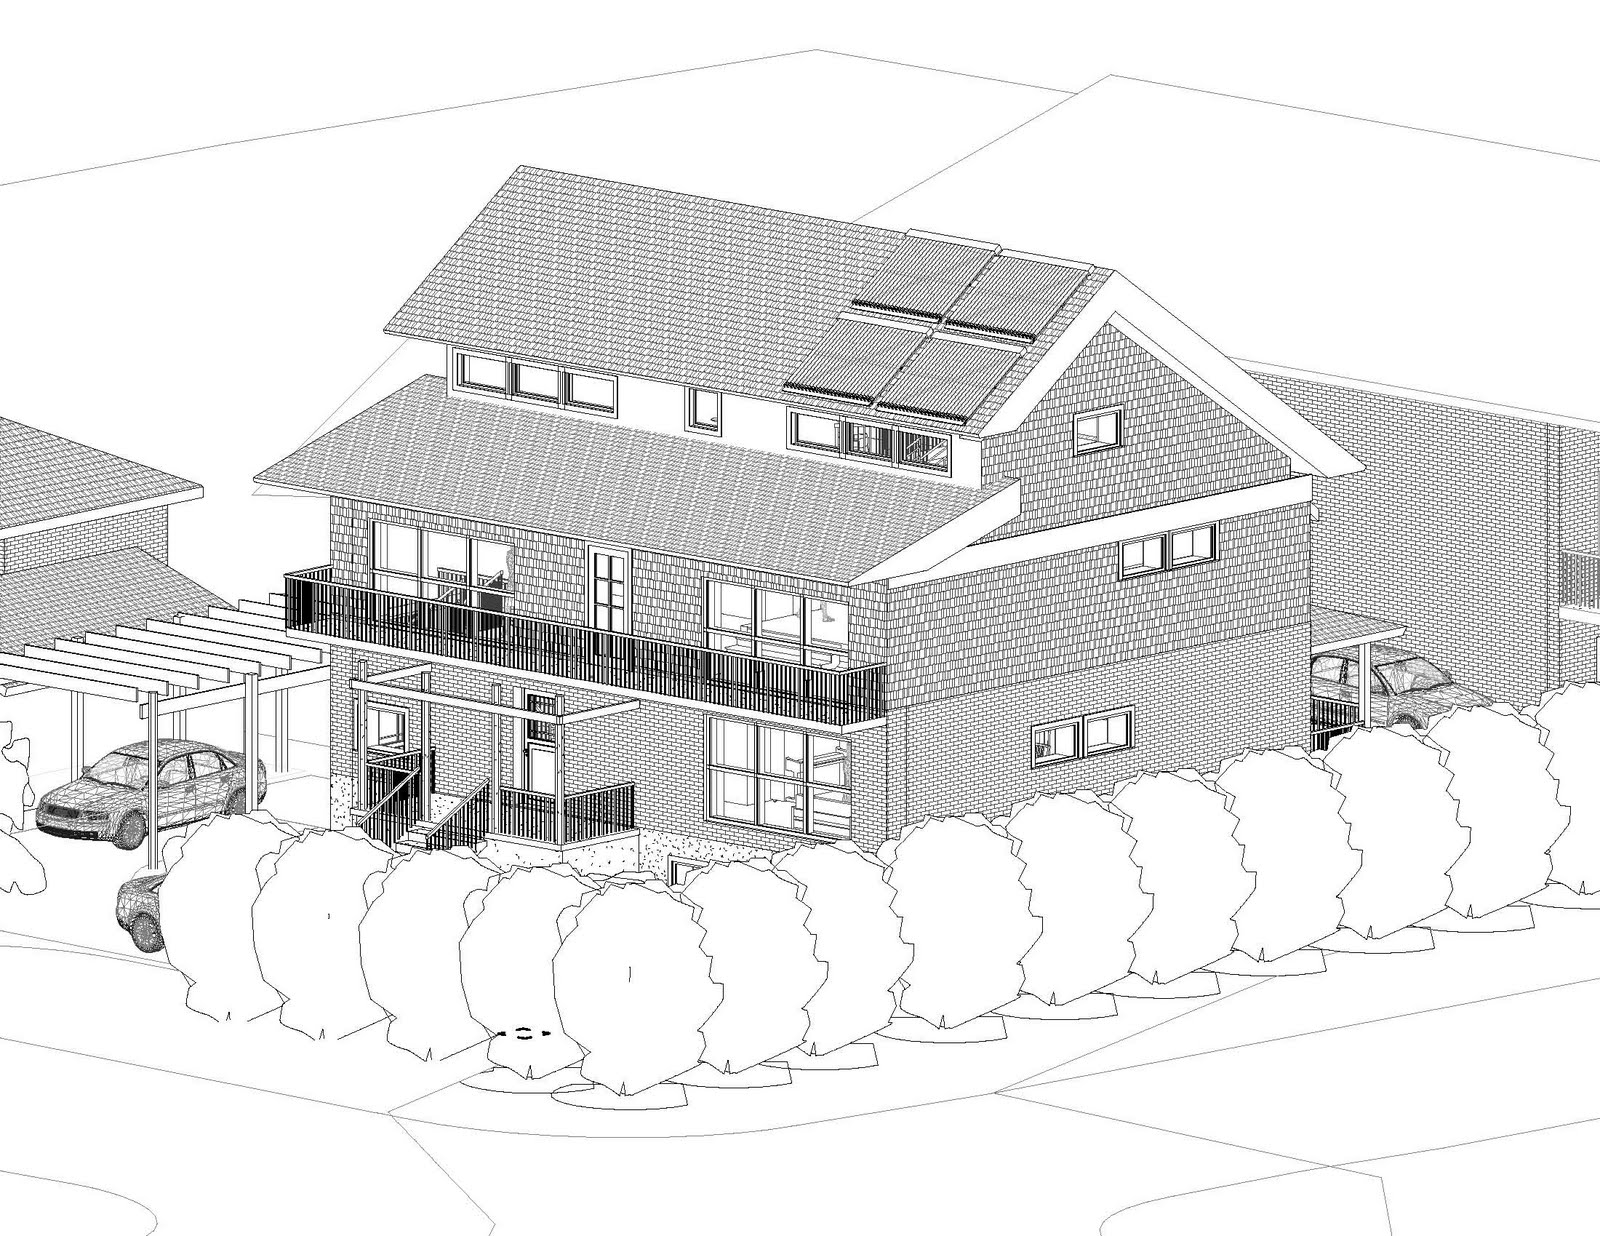 Passive House Toronto: Slit Roof with Clerestory Windows